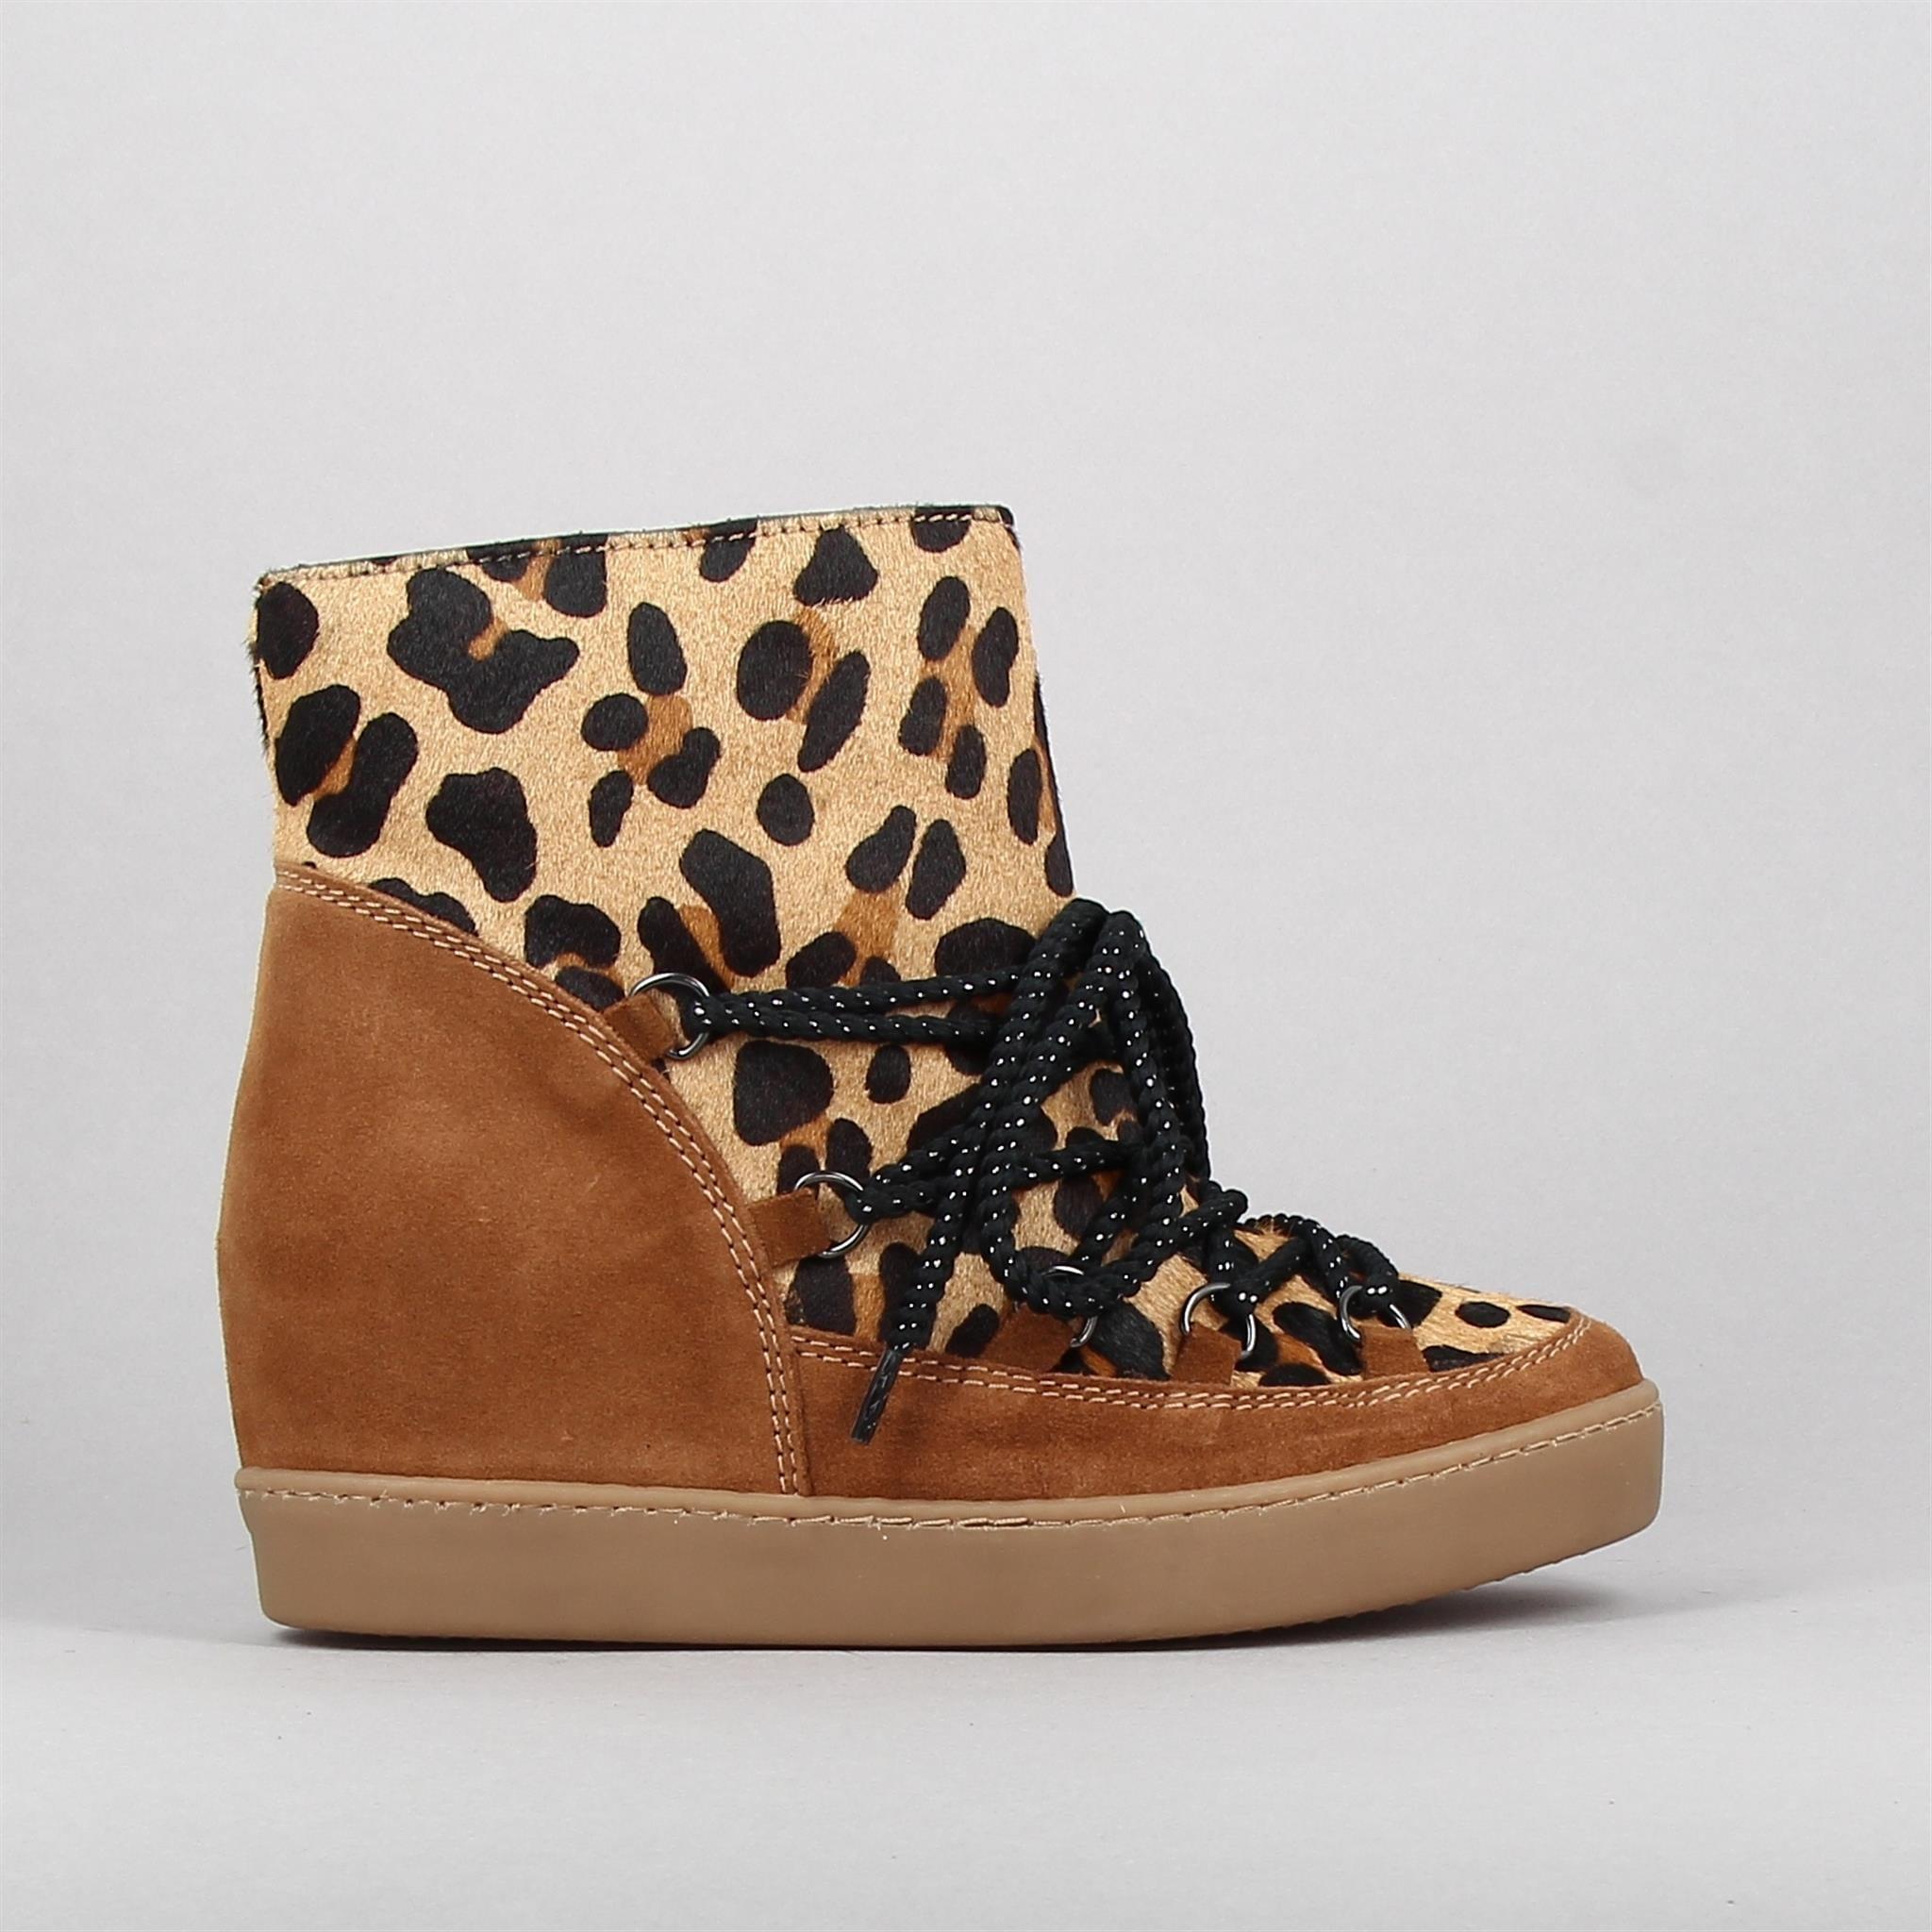 77191b-leopard-158646274-0.jpg